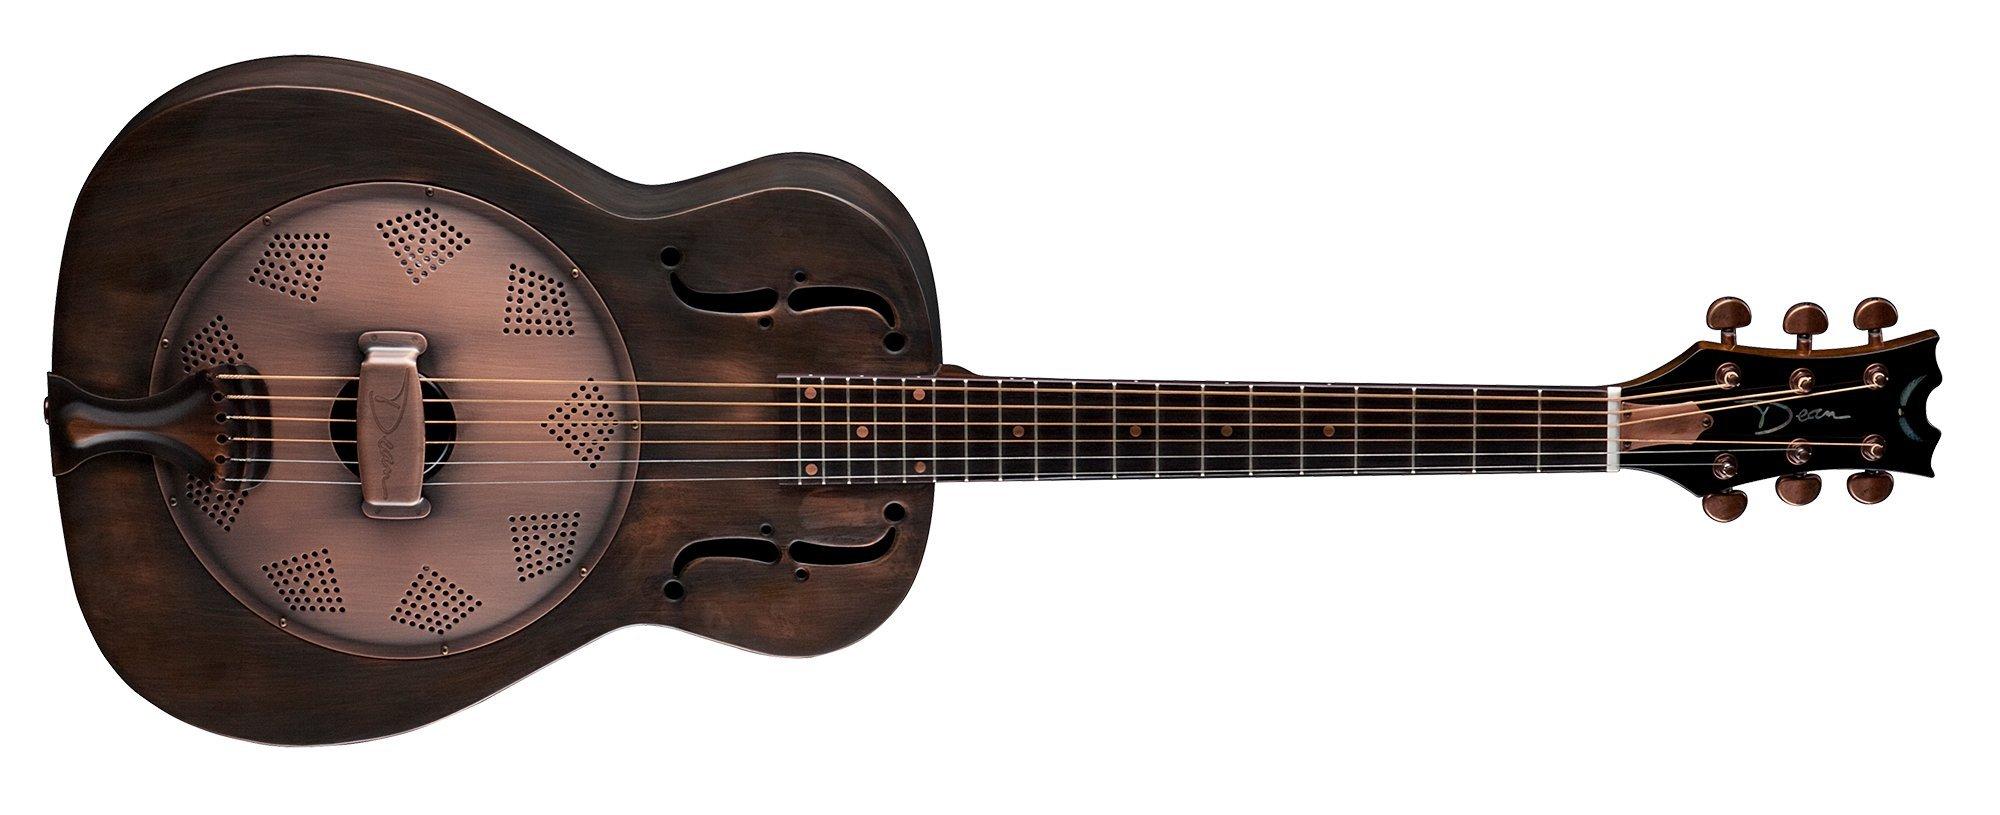 Dean Resonator Heirloom Copper by Dean Guitars